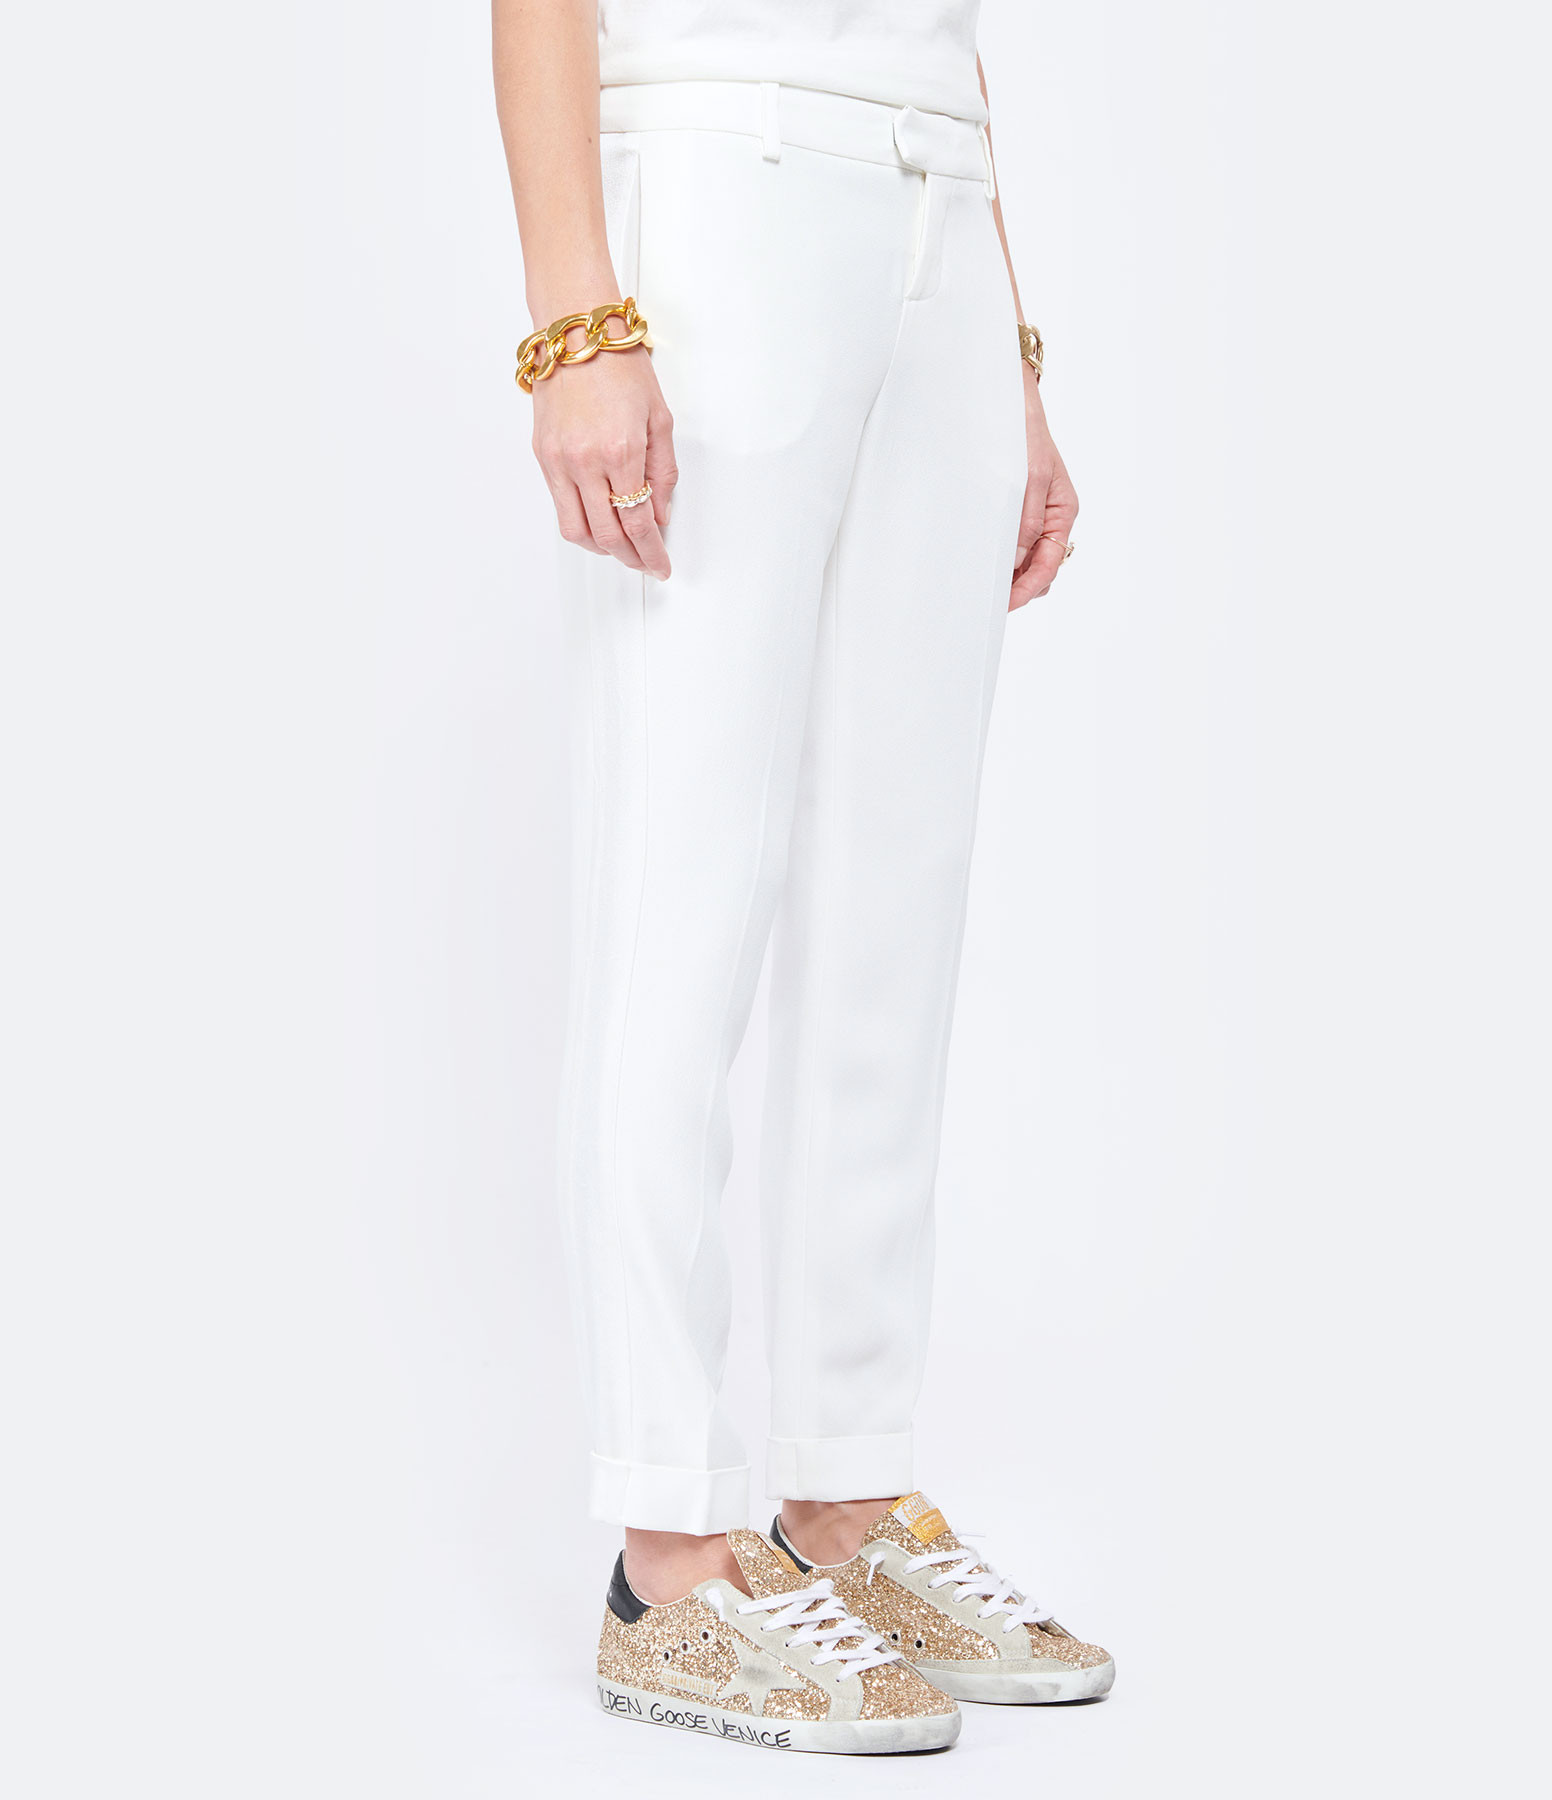 MAISON SARAH LAVOINE - Pantalon Smoking Claude Blanc